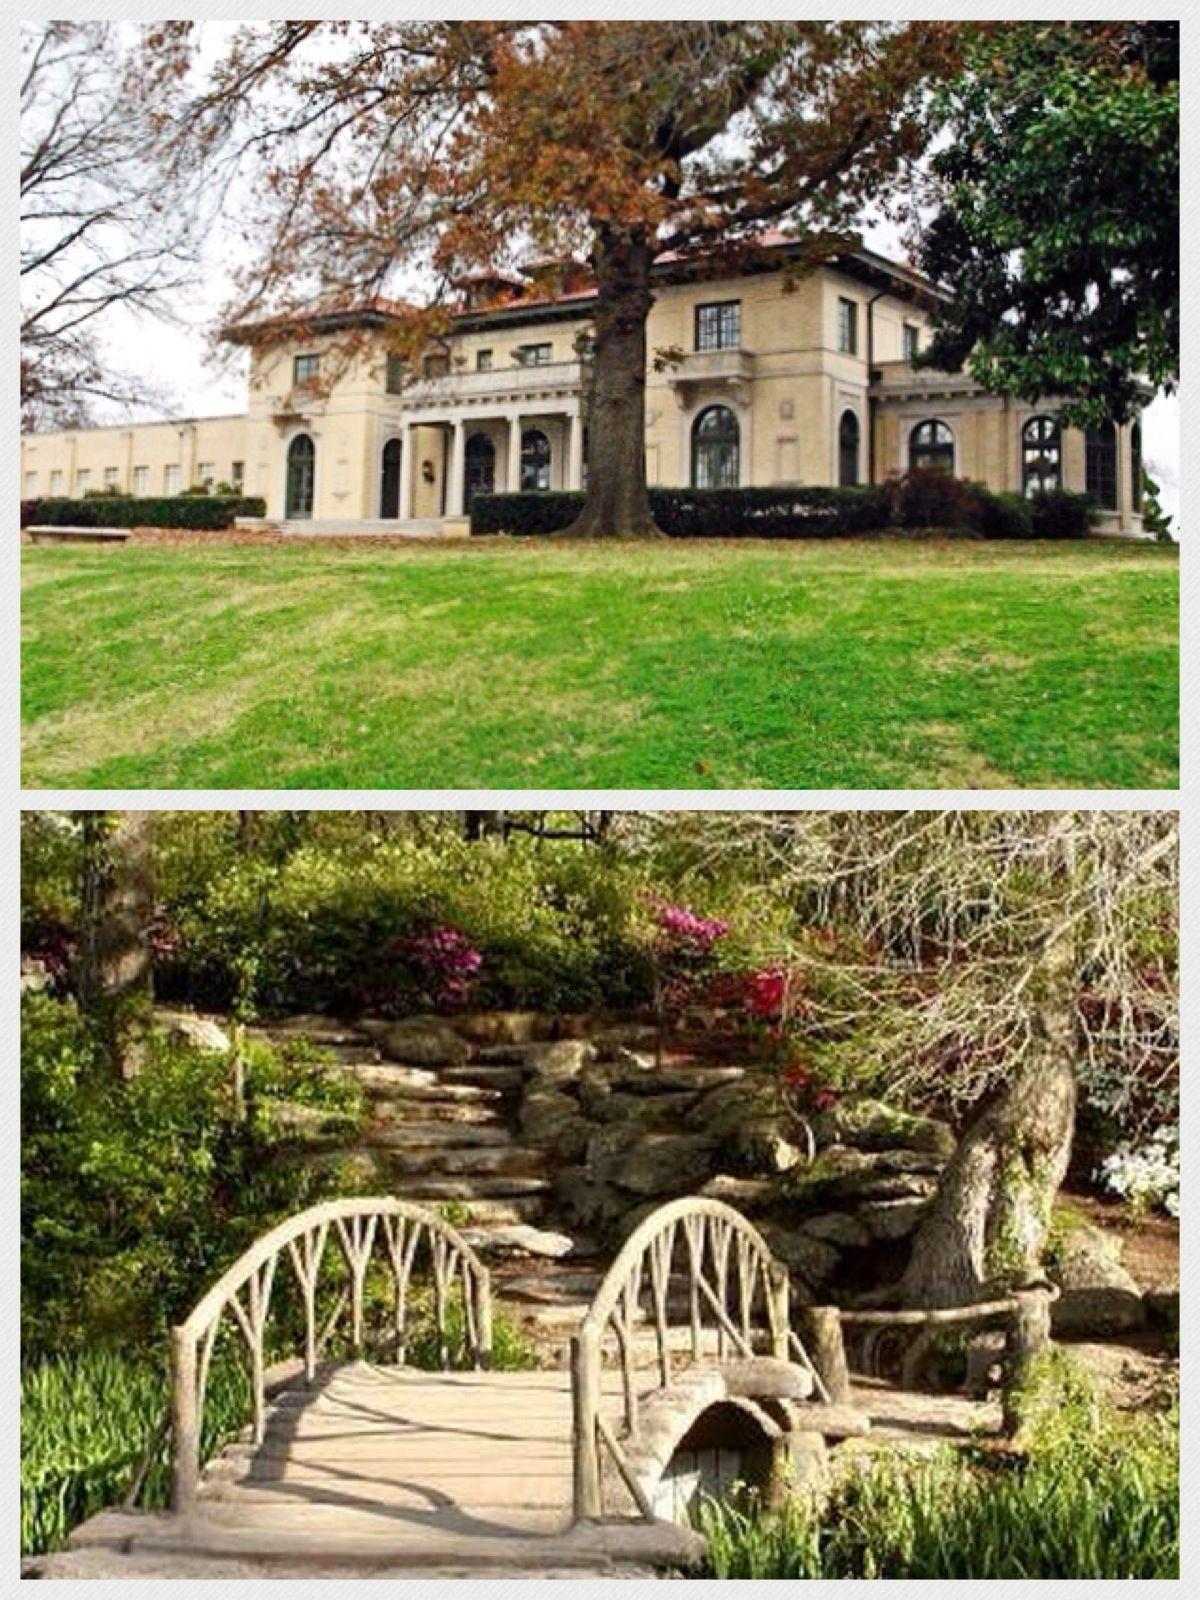 Top: Tulsa Garden Center. Bottom: Woodward Park Bridge. Woodward Park  Spreads Over